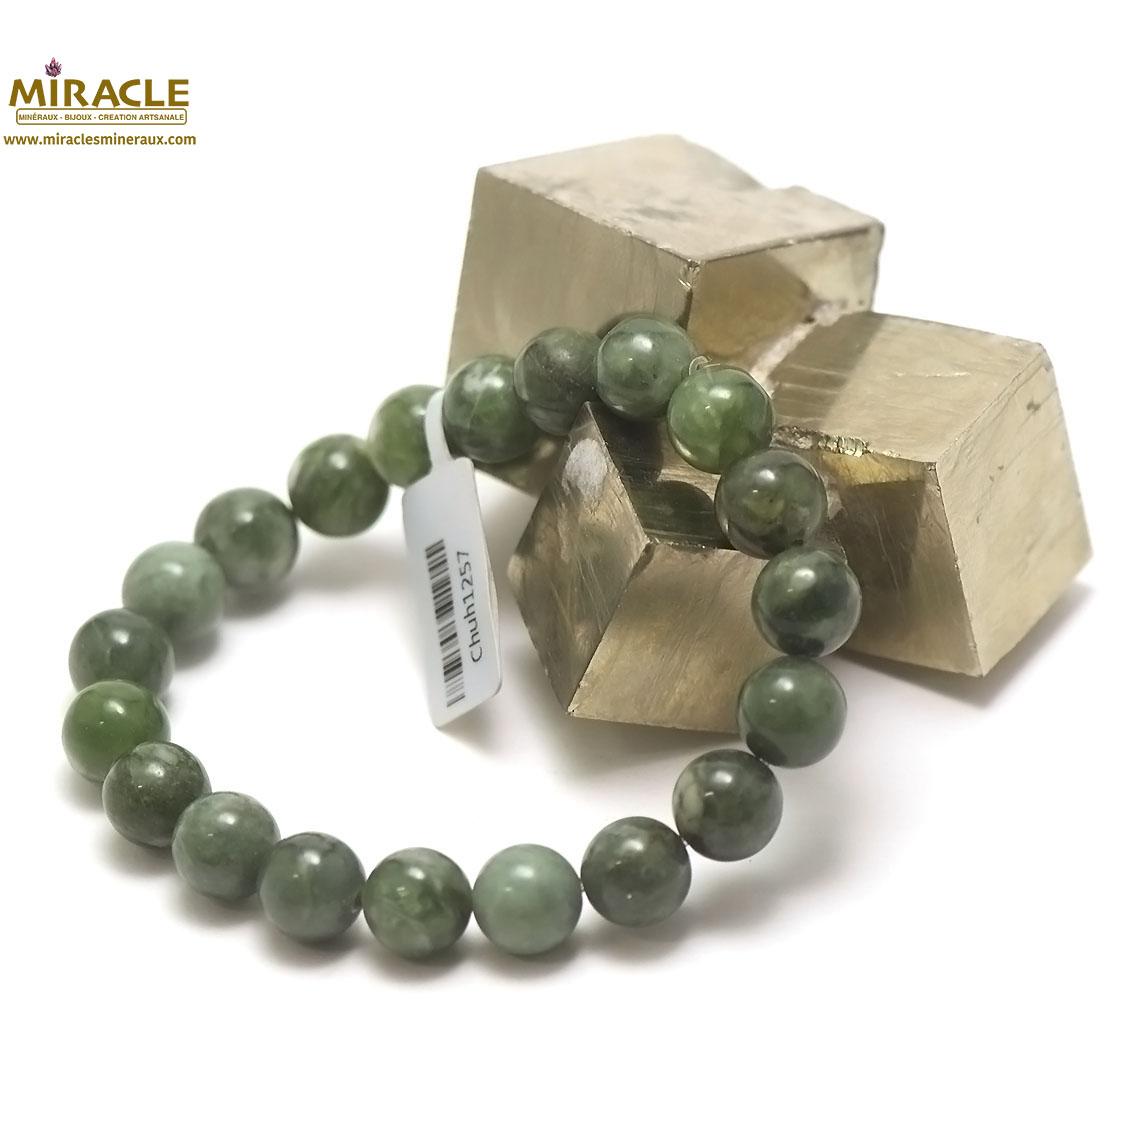 Bracelet jade néphrite de Canada, perle ronde 10 mm